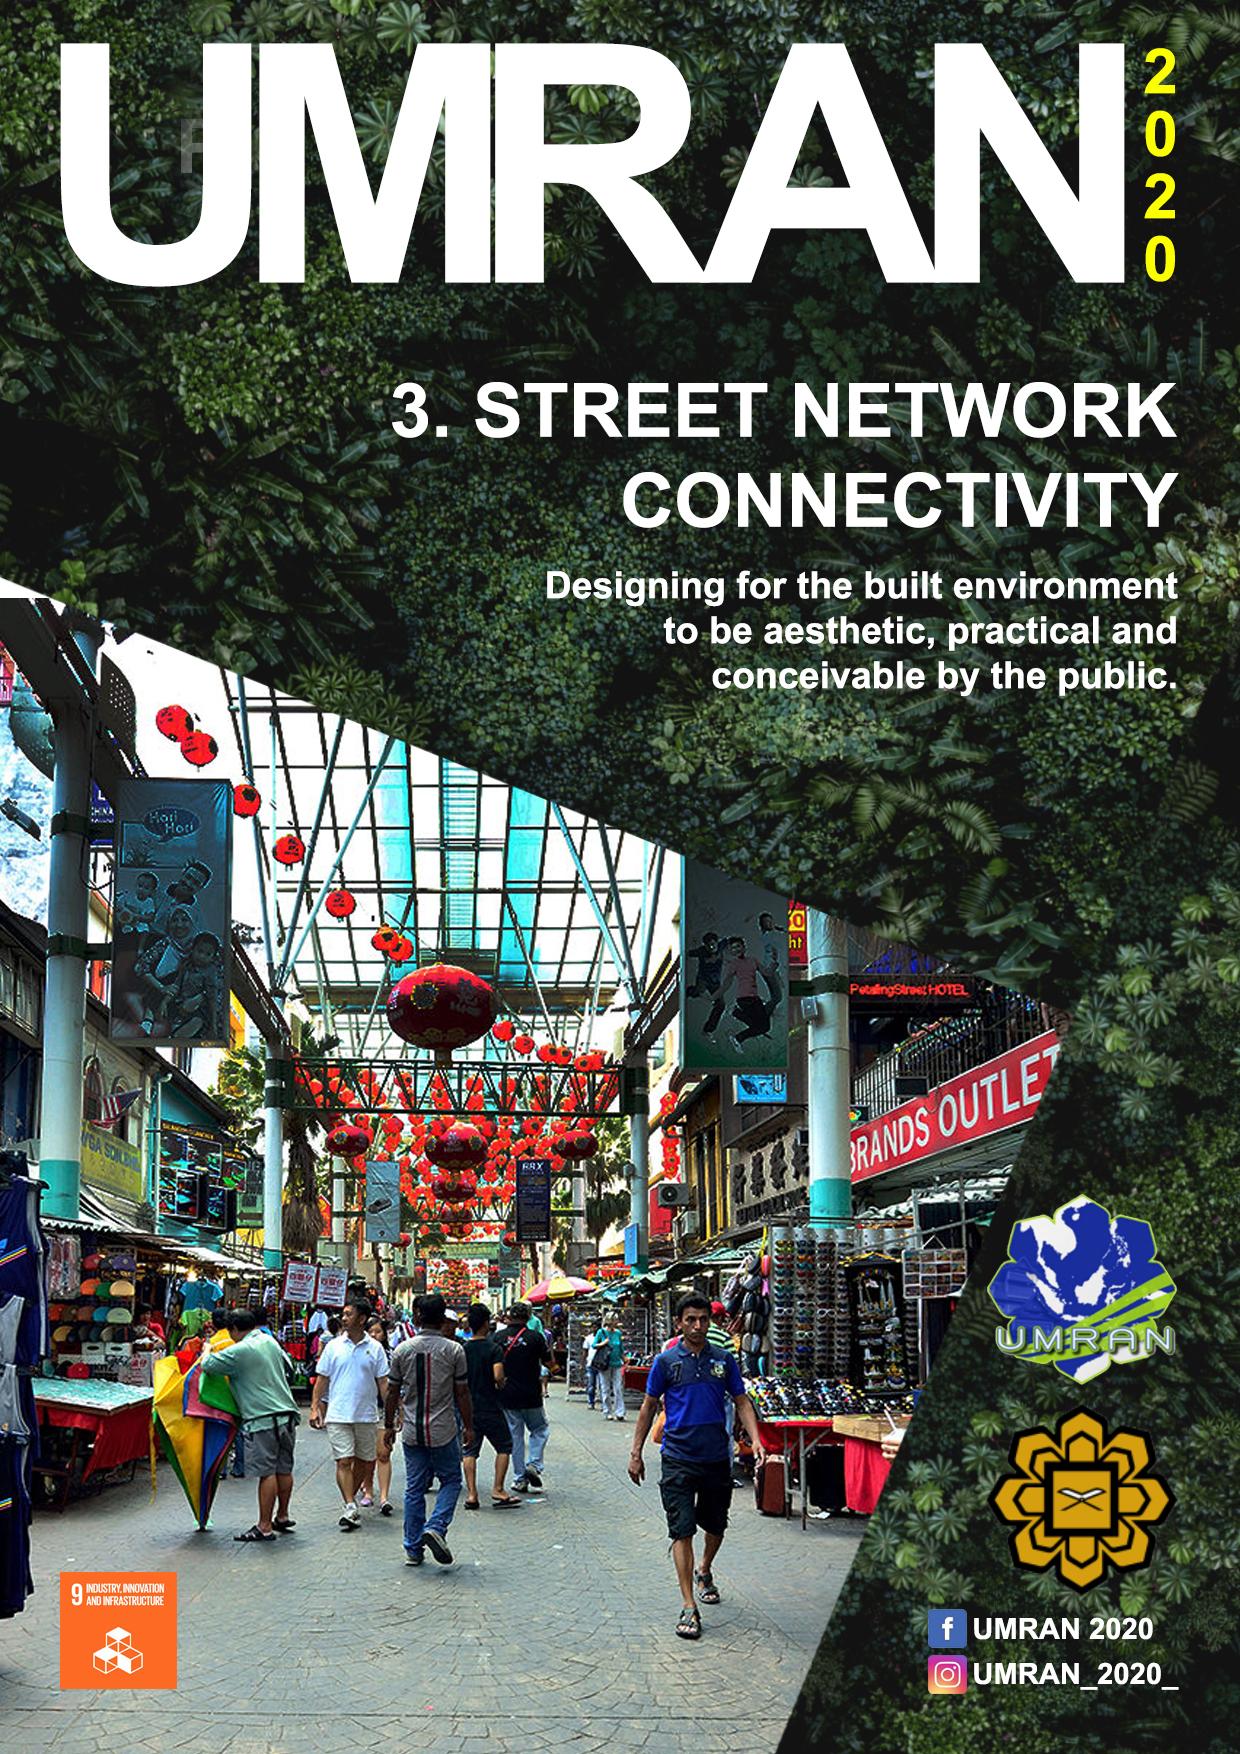 UMRAN 2020: Street Network Connectivity